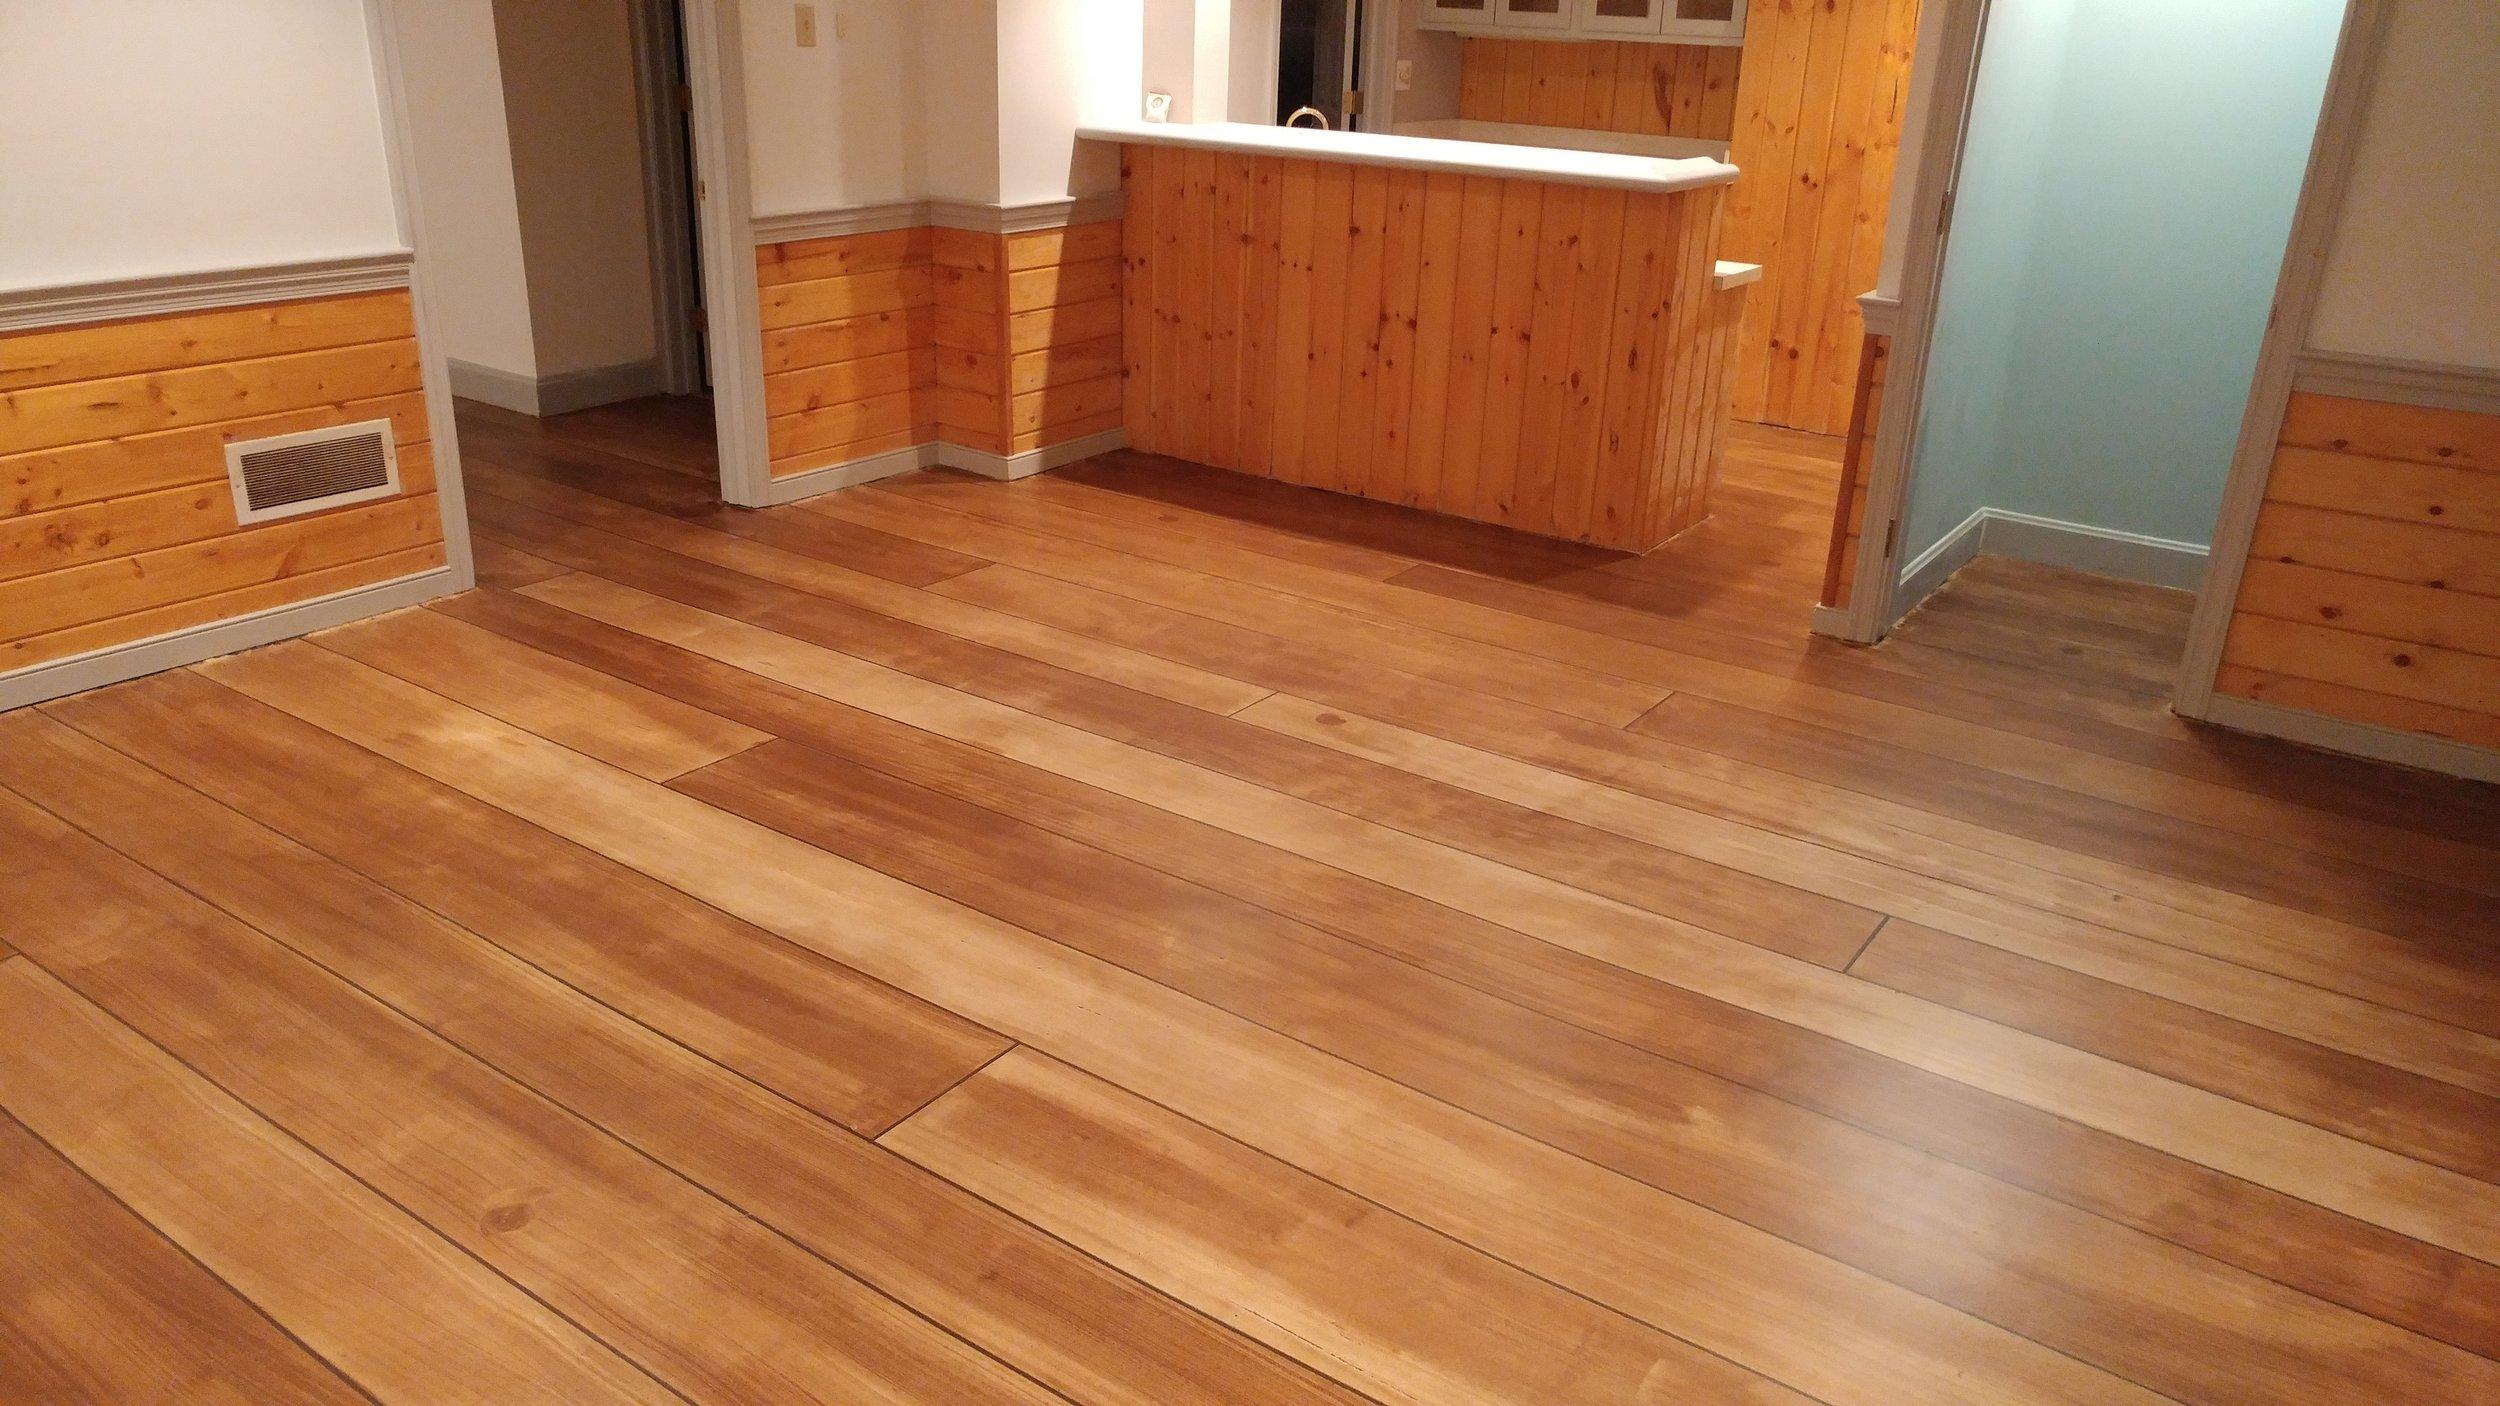 Rustic Concrete Wood Basement